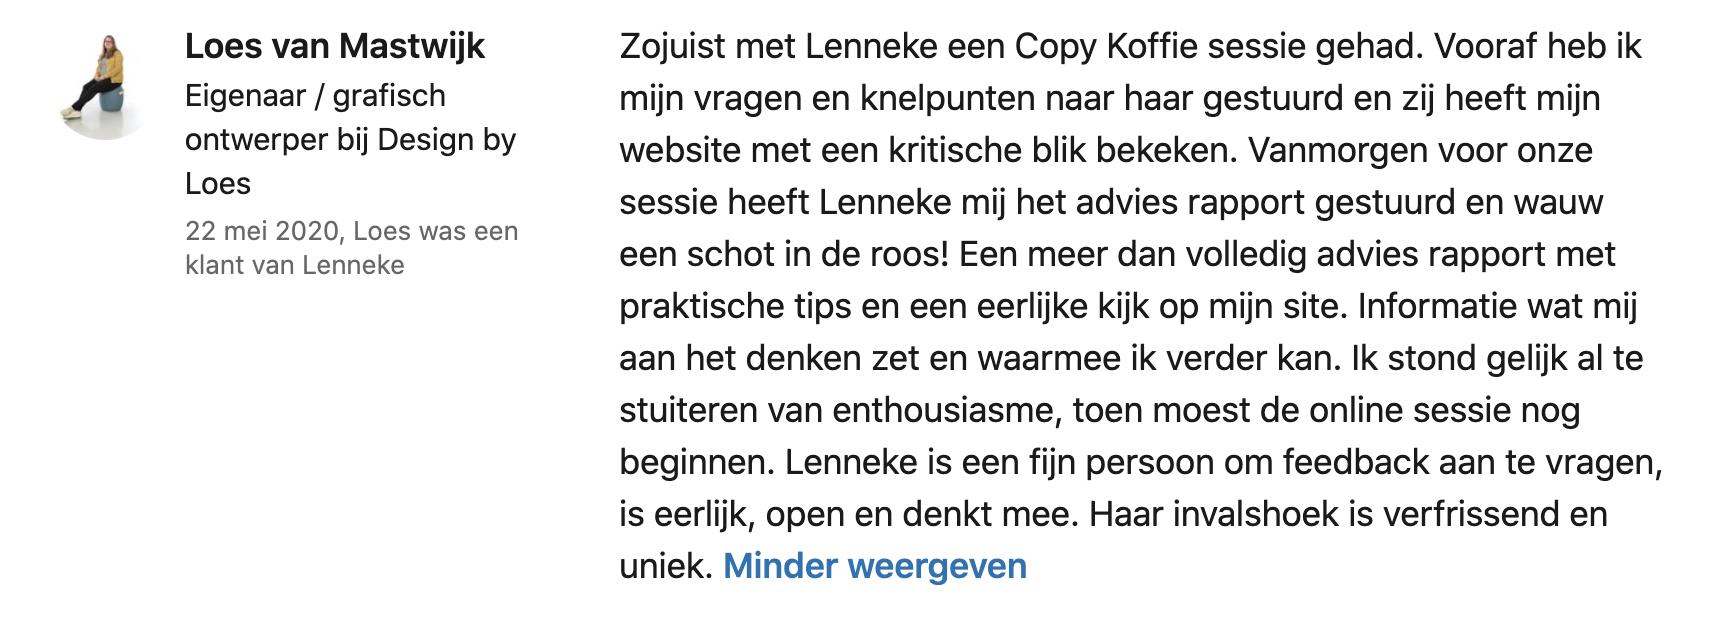 Review Copy Koffie tekst- en conversiecoaching